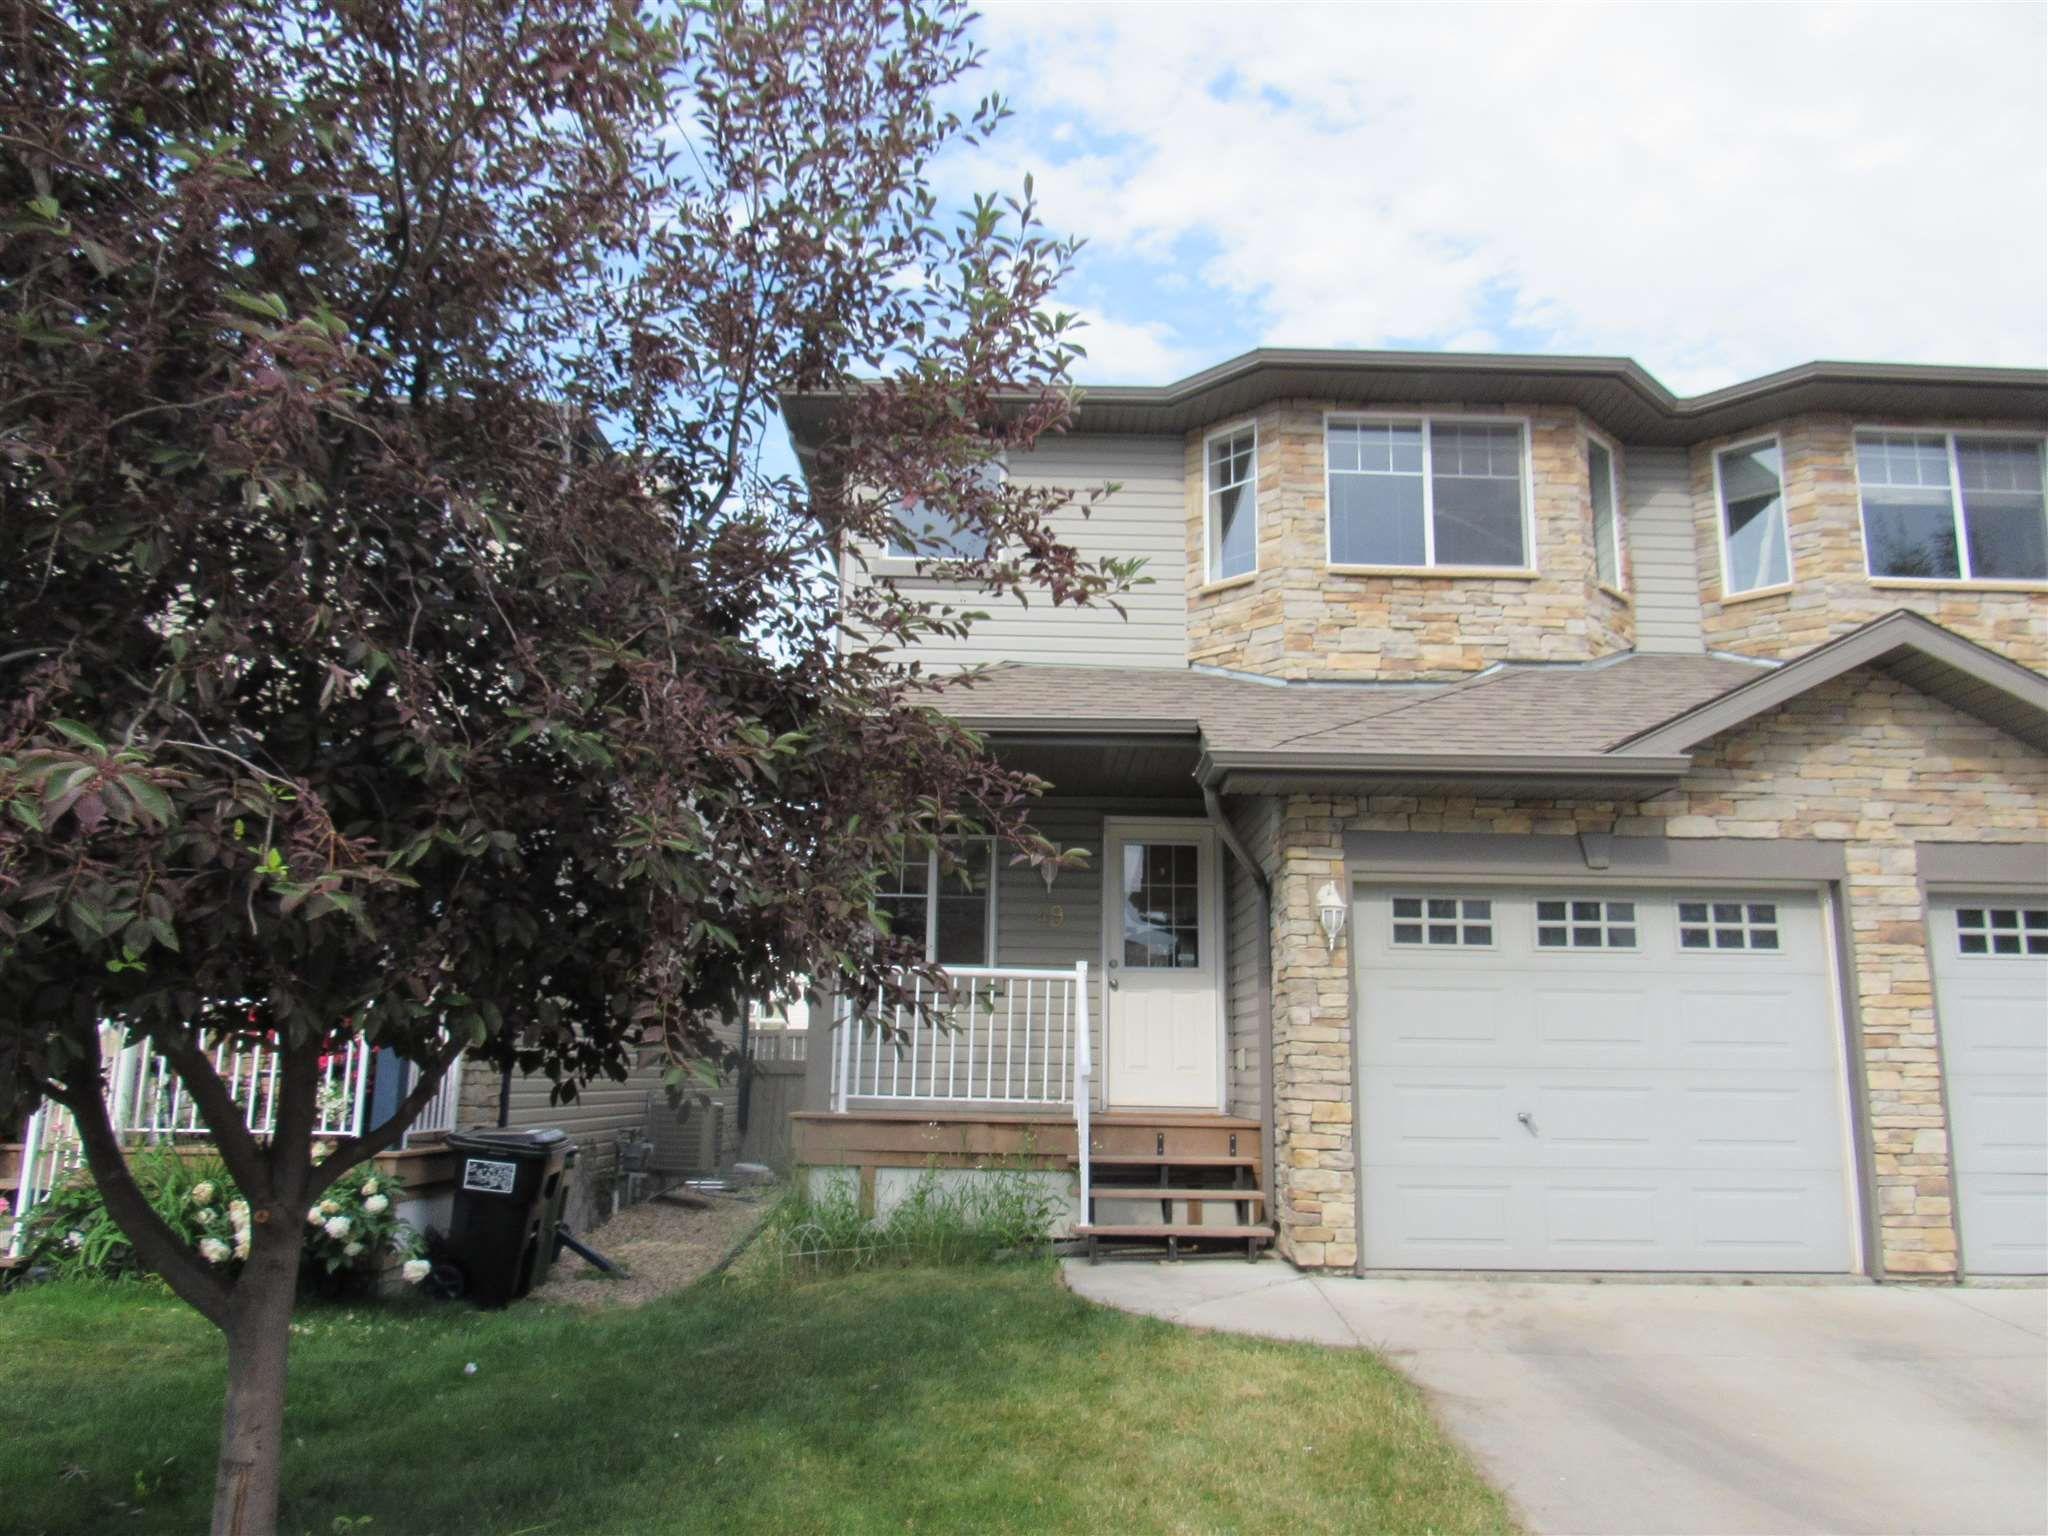 Main Photo: 49 6304 SANDIN Way in Edmonton: Zone 14 House Half Duplex for sale : MLS®# E4252566